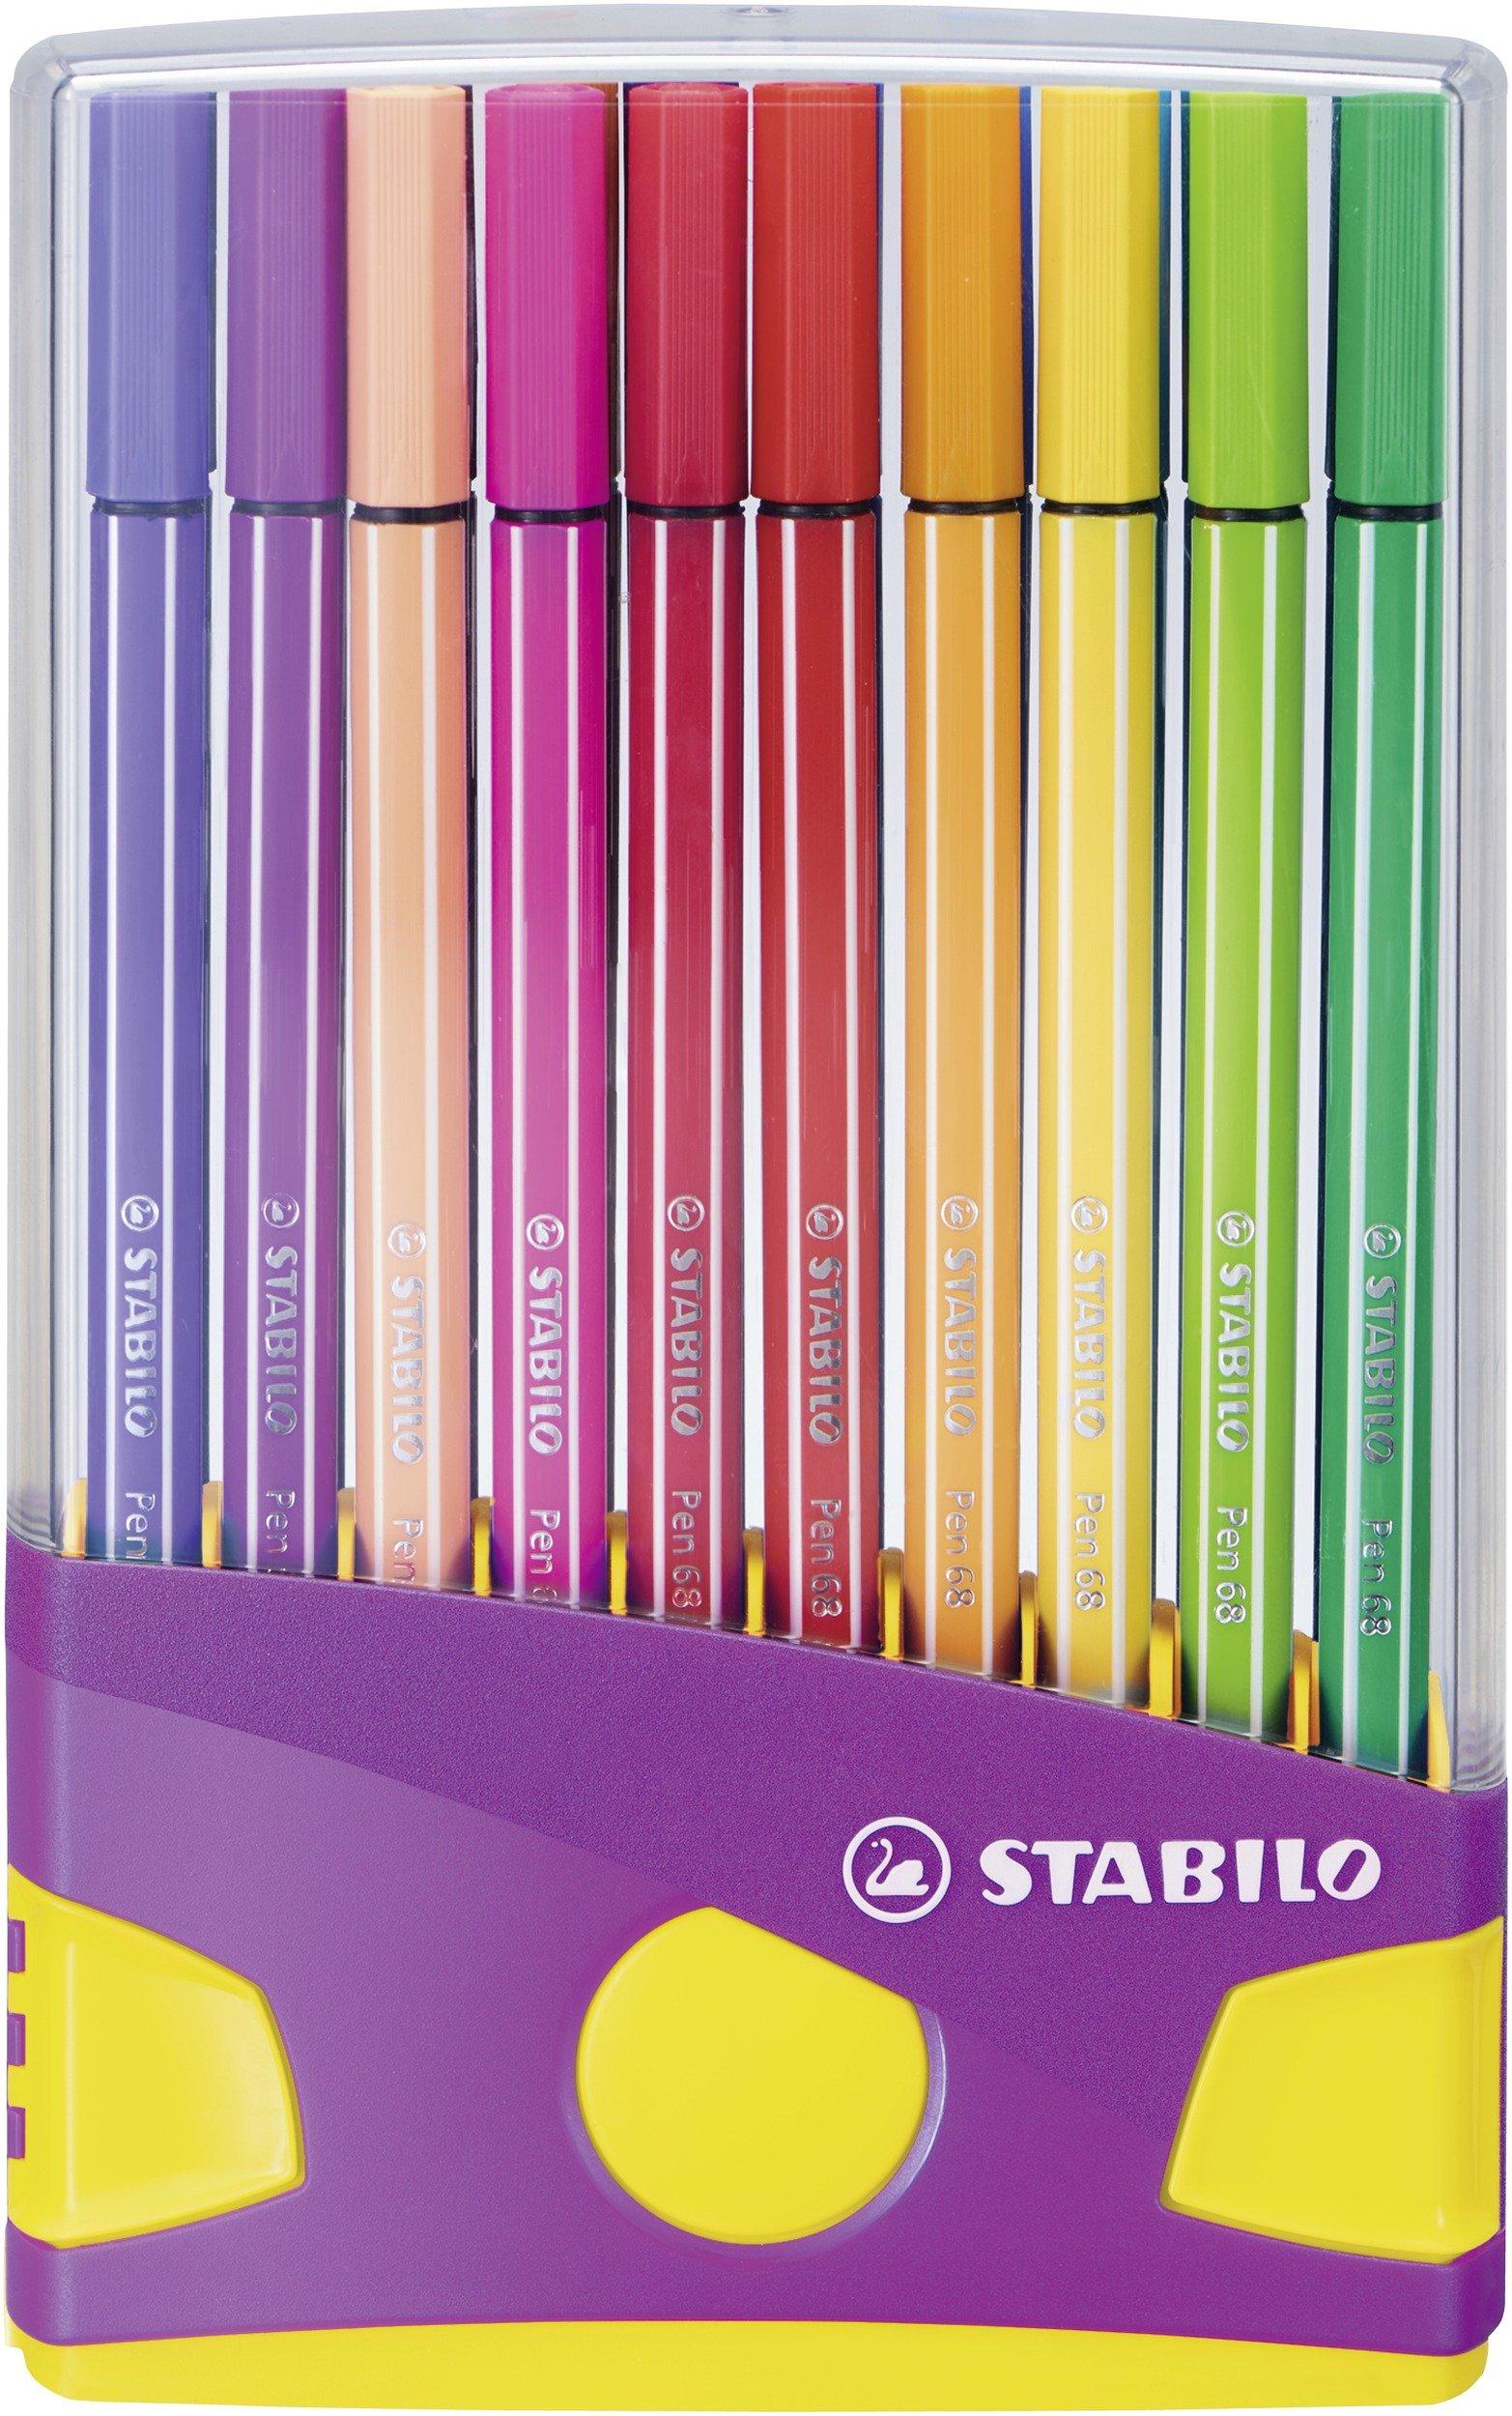 Rotulador STABILO Pen 68 – Estuche premium Colorparade con 20 colores